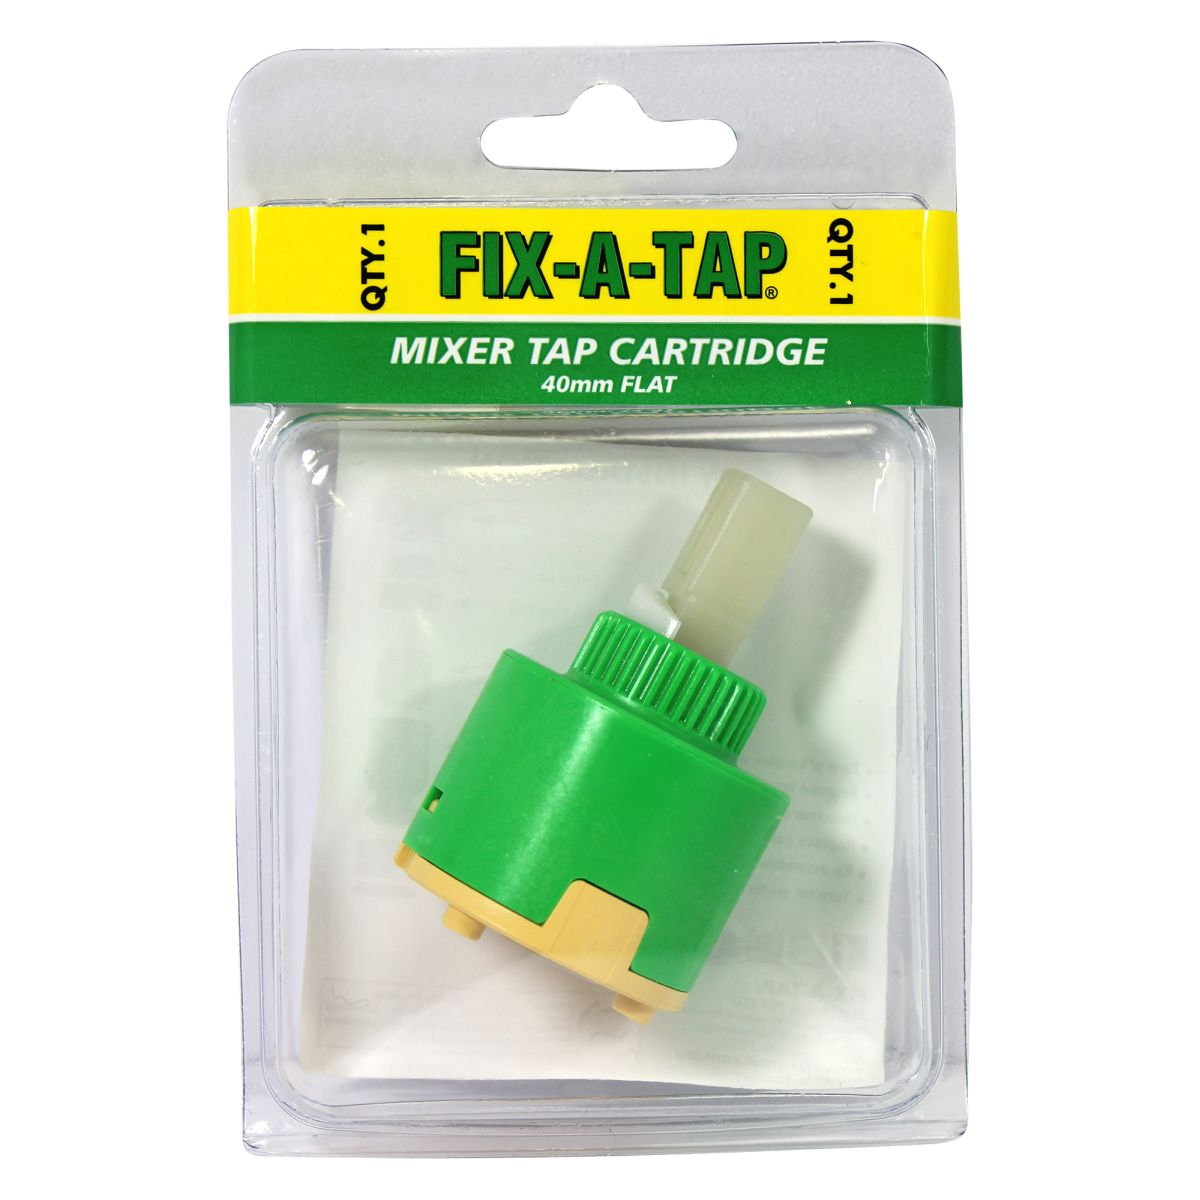 FIX-A-TAP Mixer Tap Cartridge Flat 40mm